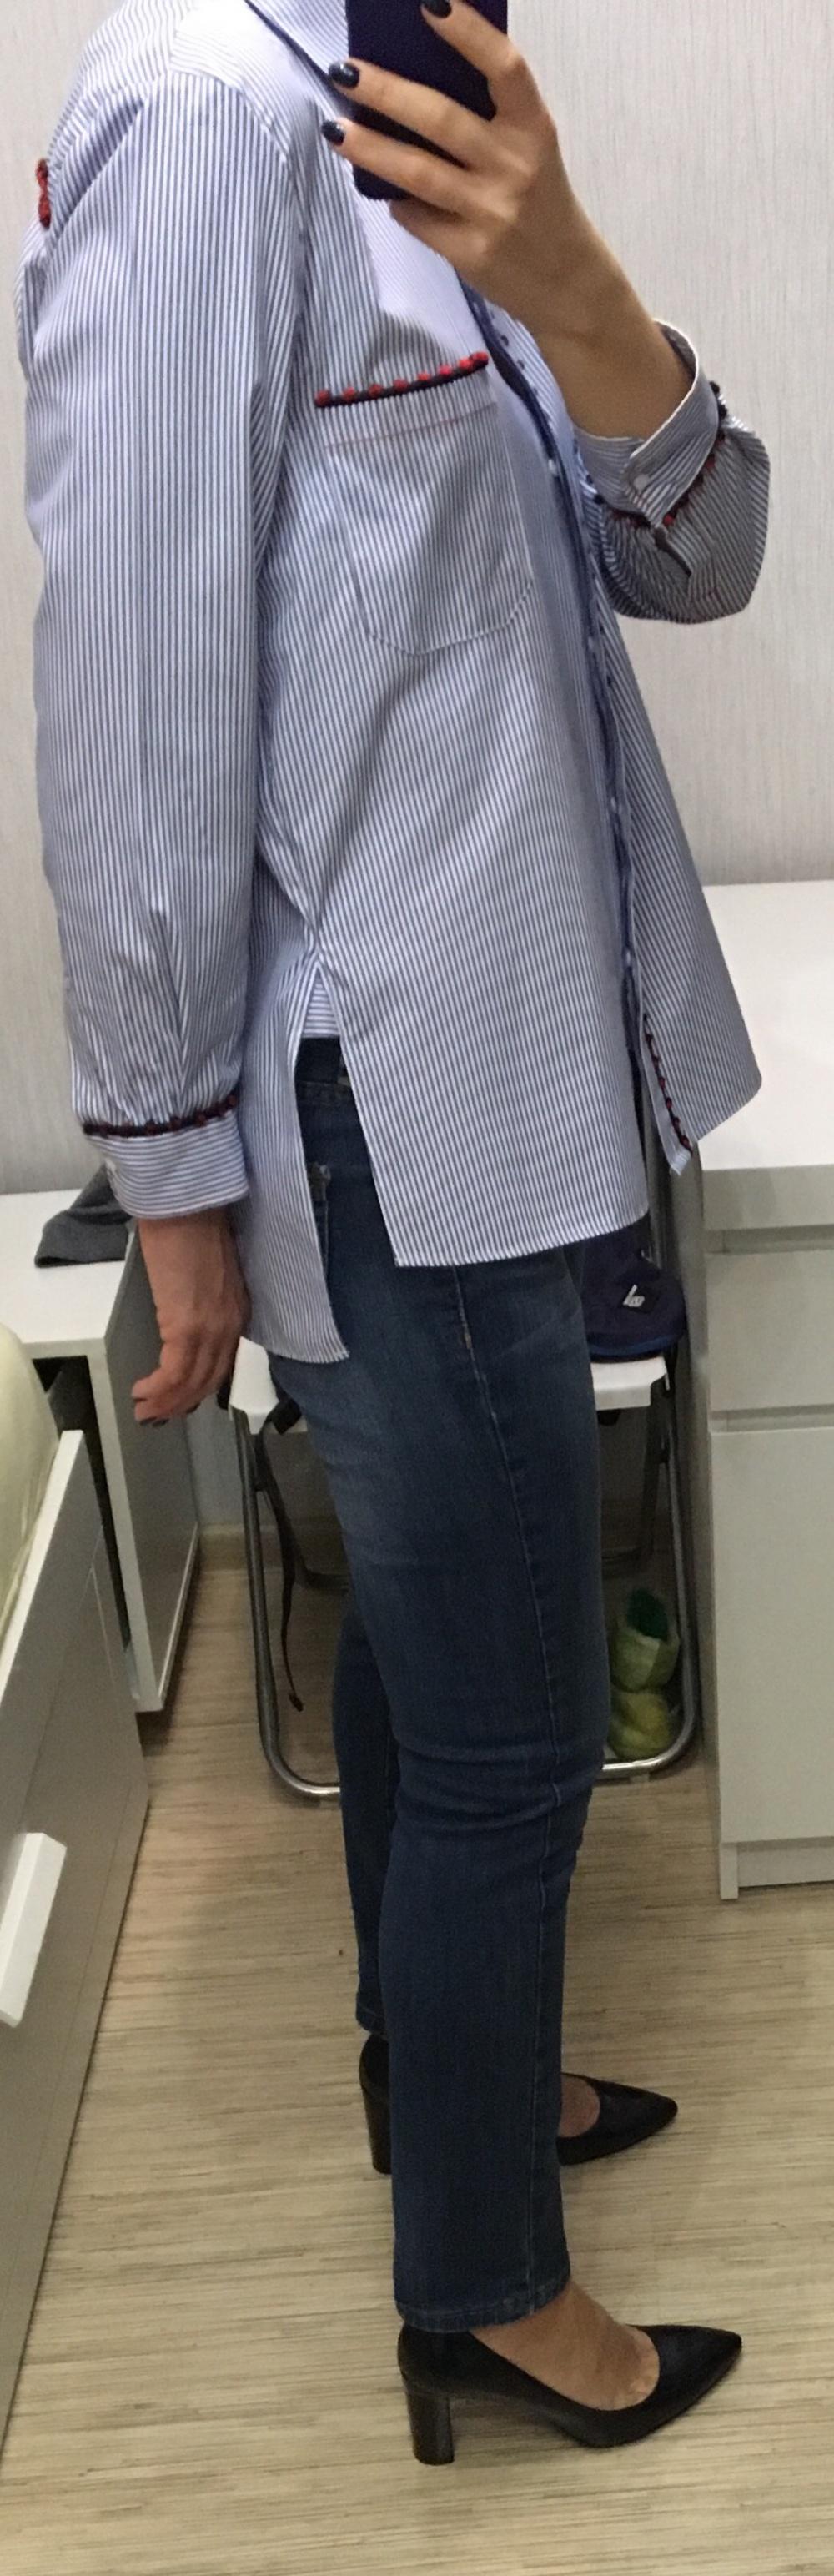 Сет рубашка Zara, размер М+ джинсы Bell Bottom, размер 44